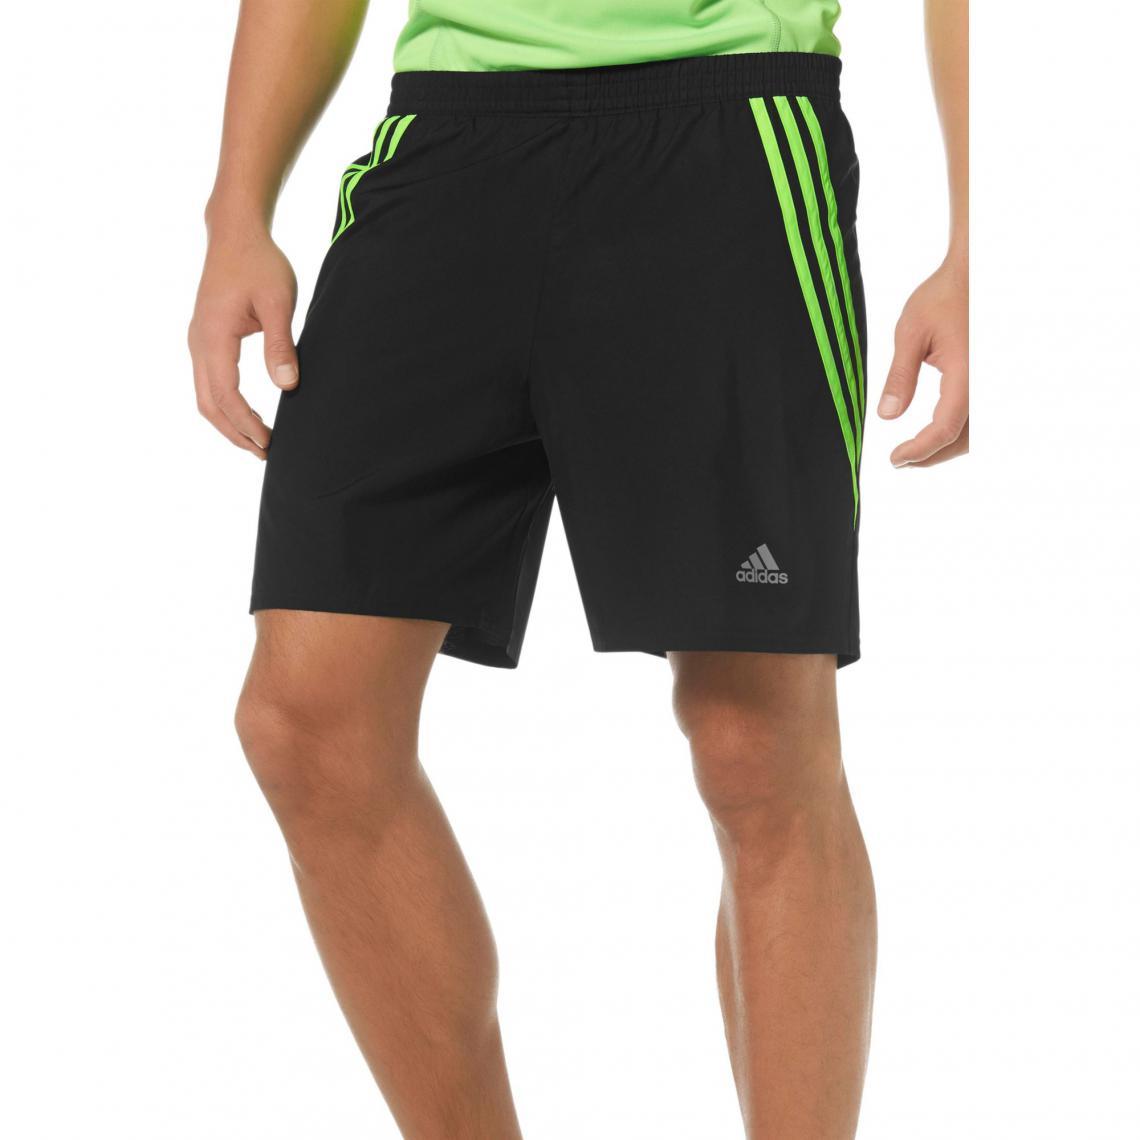 6311c8431c993 Short de running sport homme adidas Performance Adidas Performance Homme